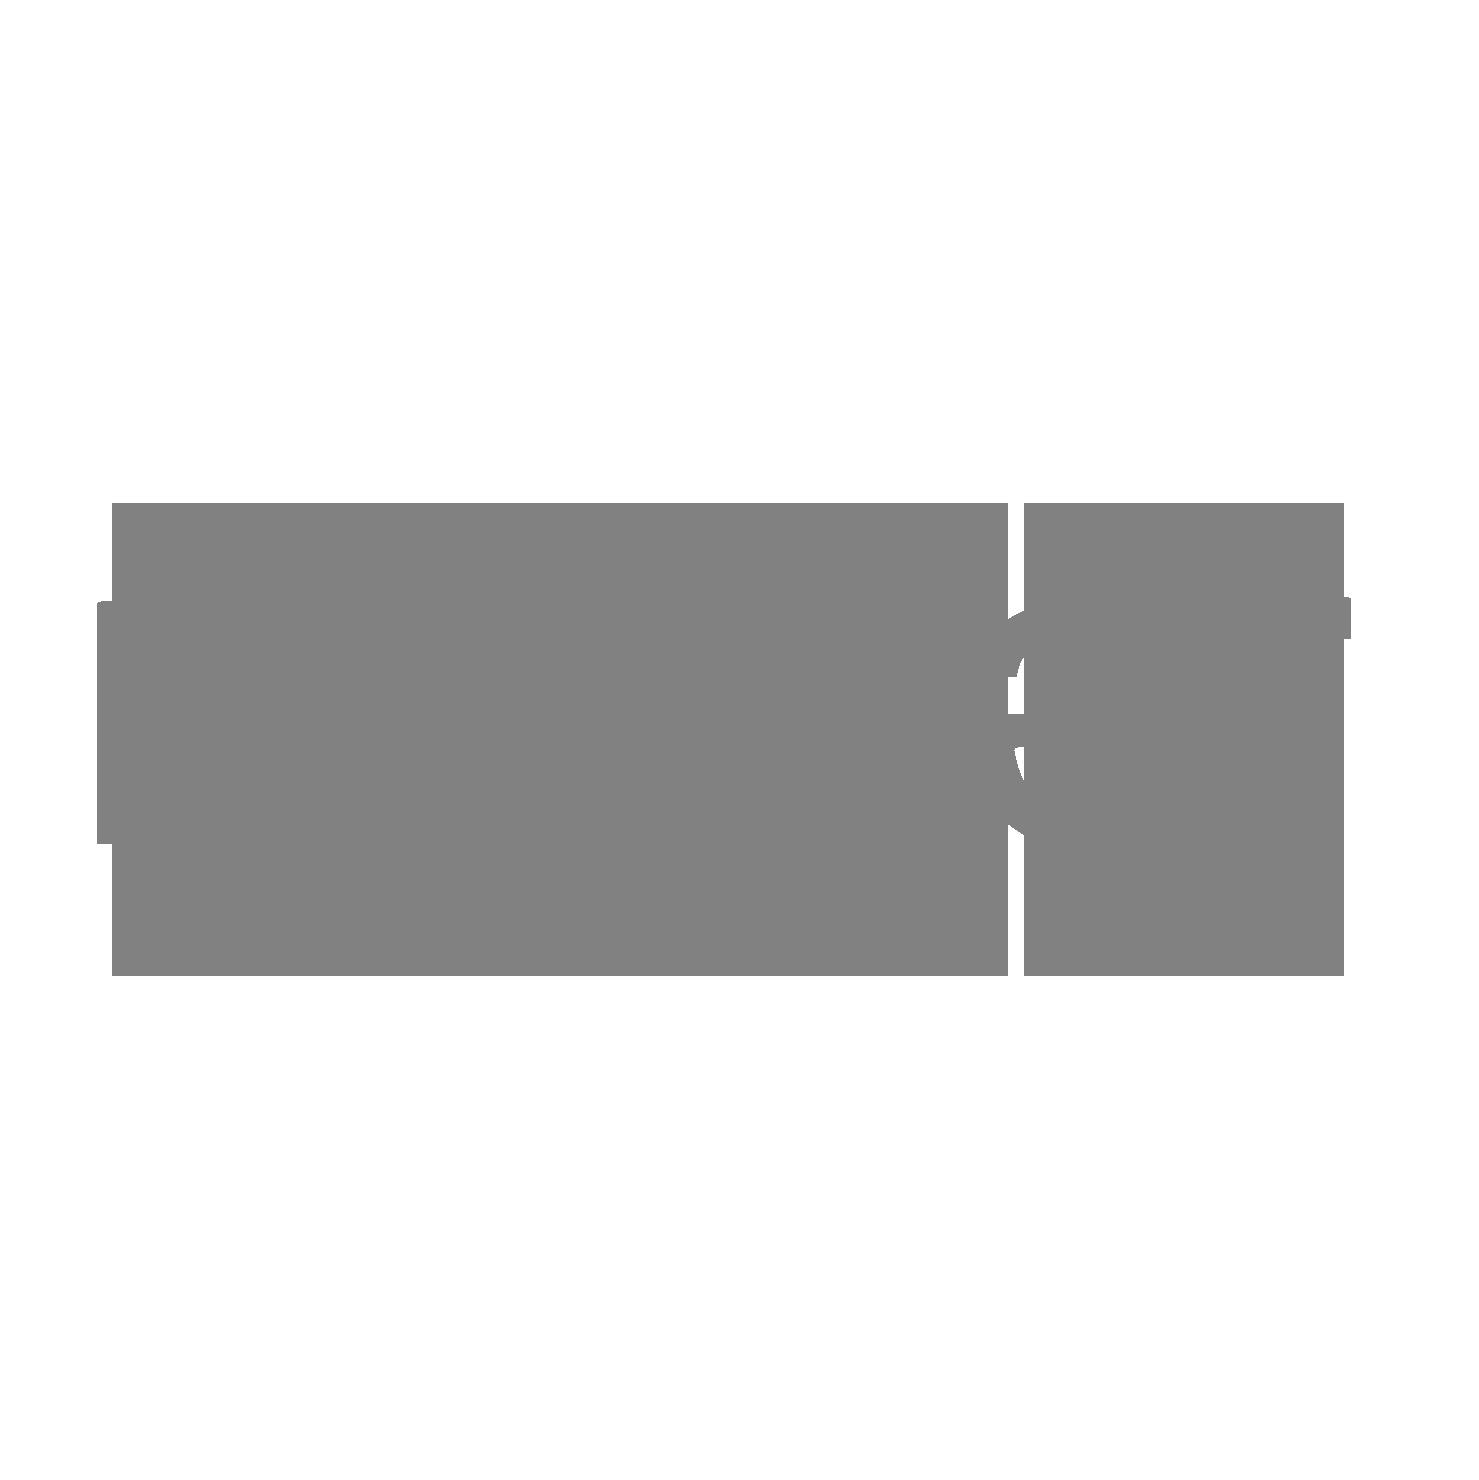 Nekter_001.png